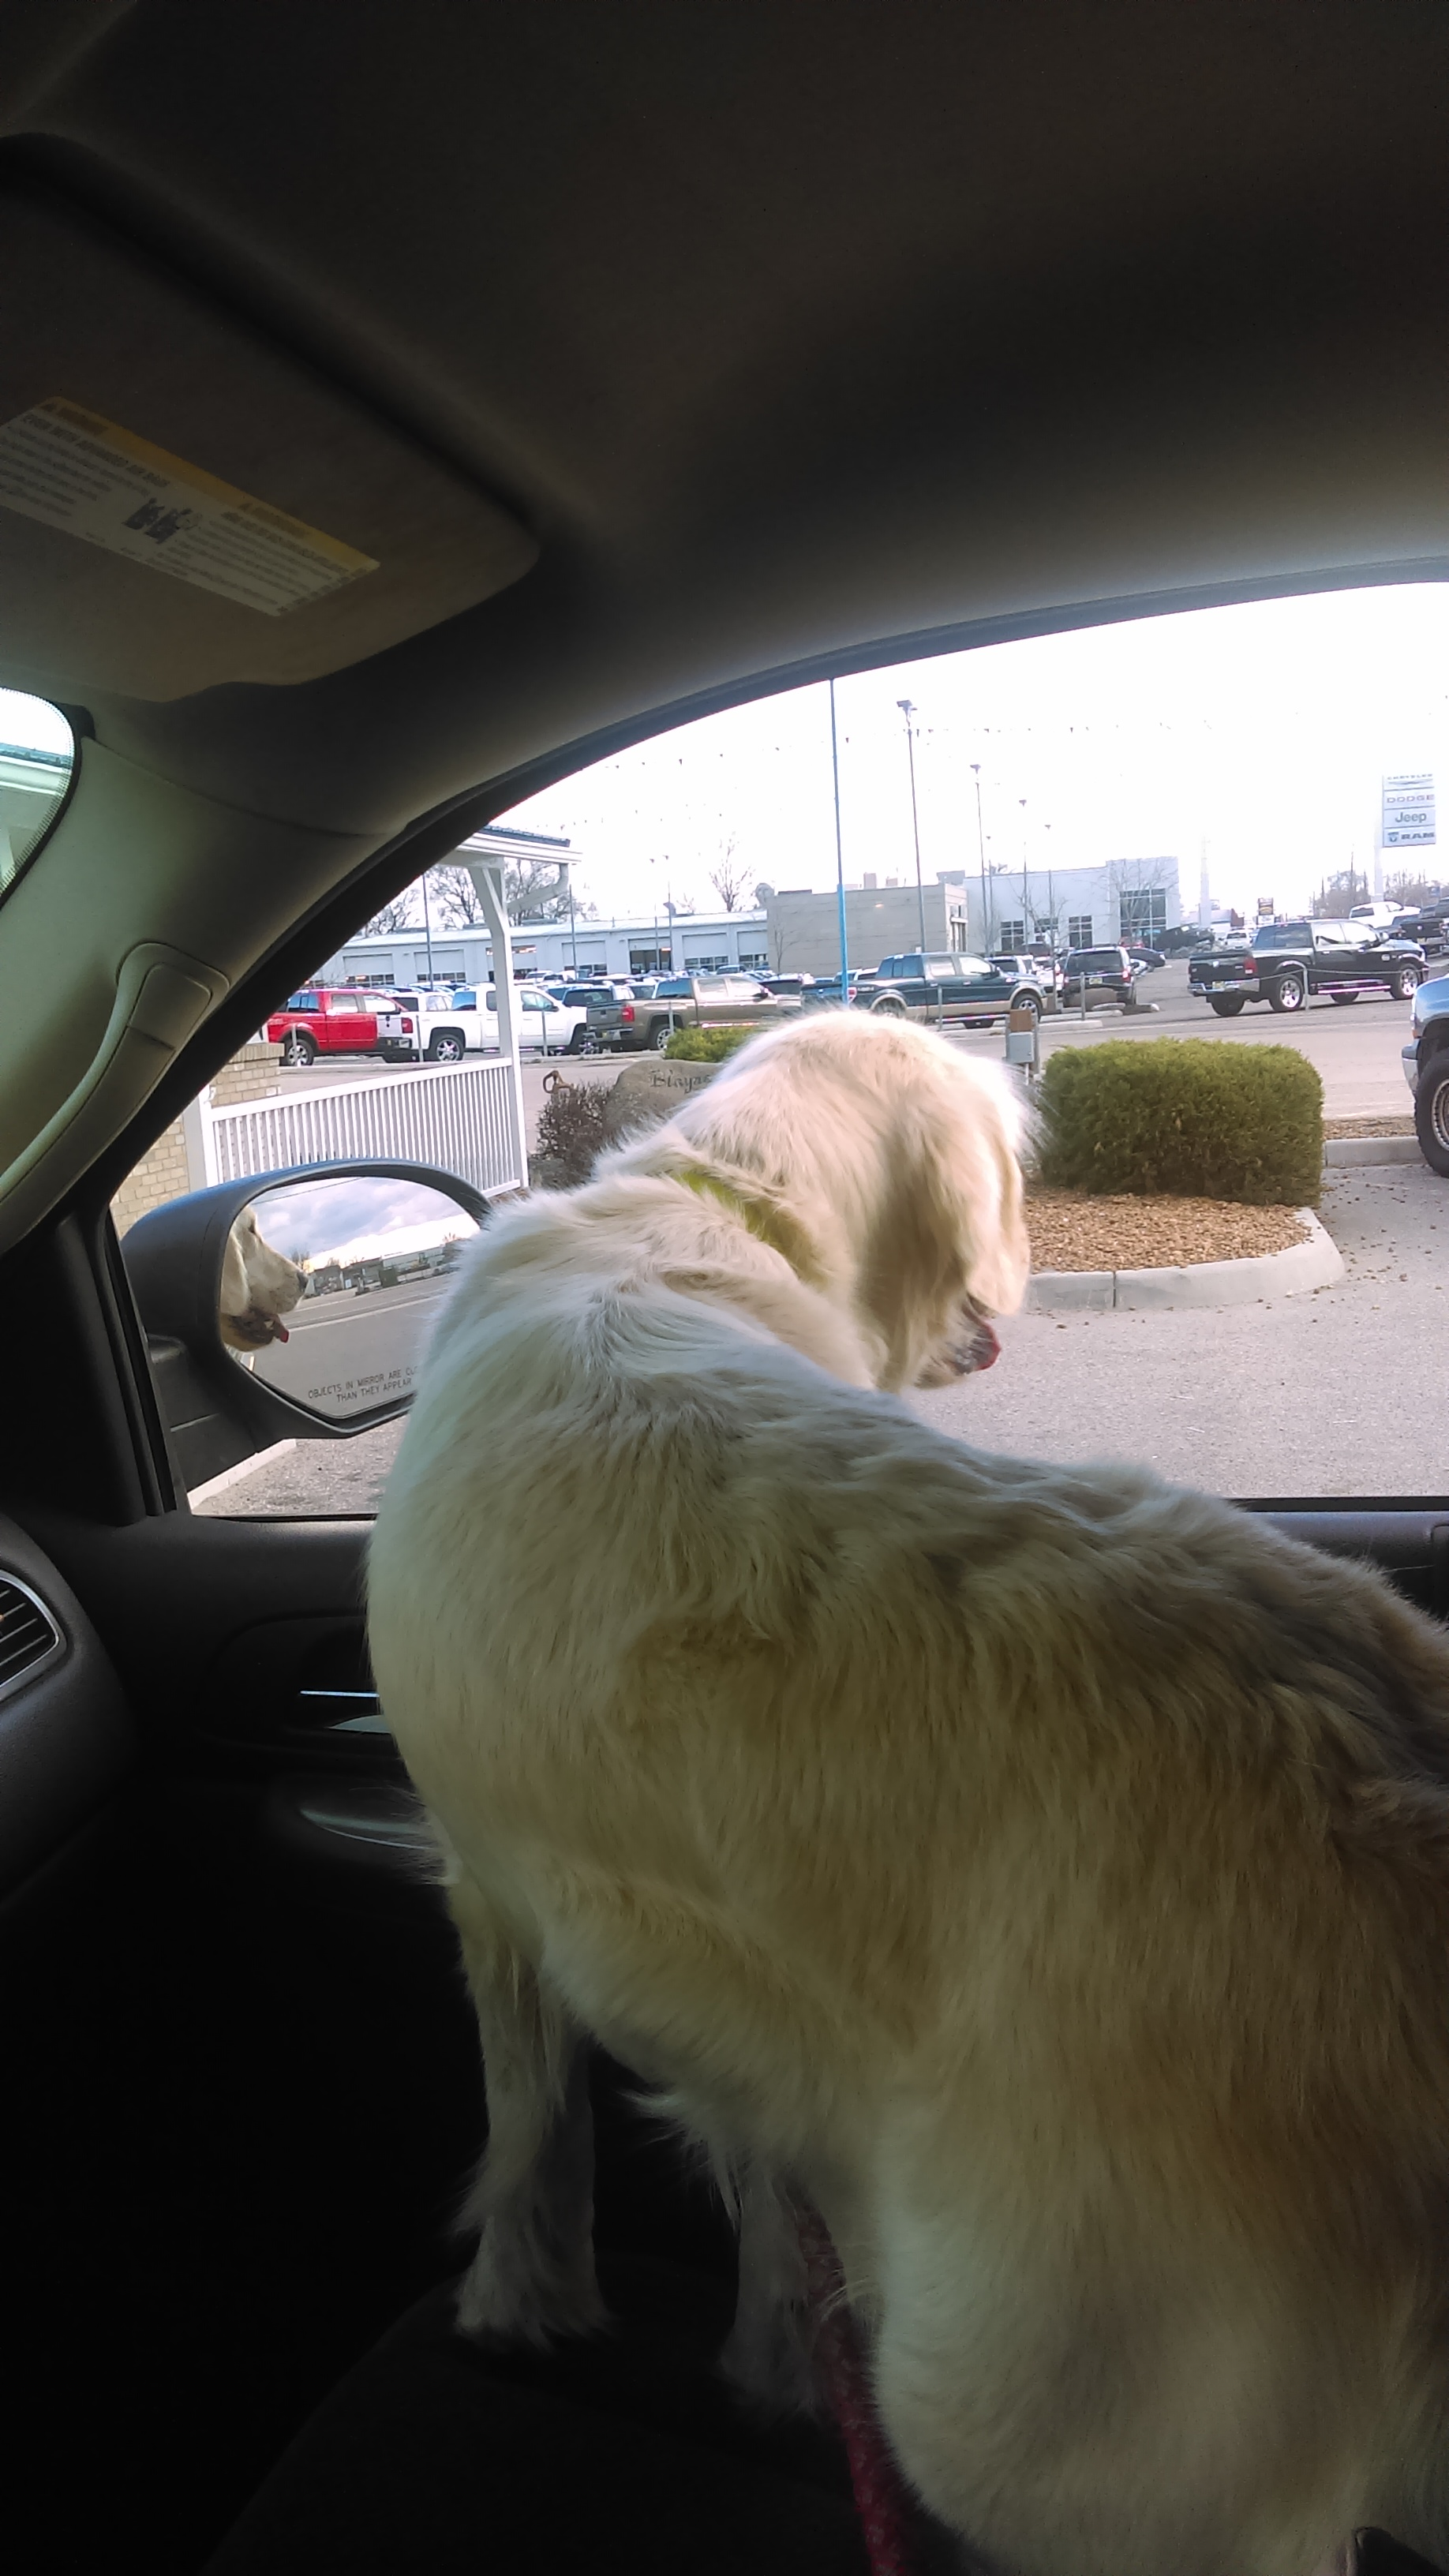 Pinkerton_ride_to_vet_nursery_puppies.jpg